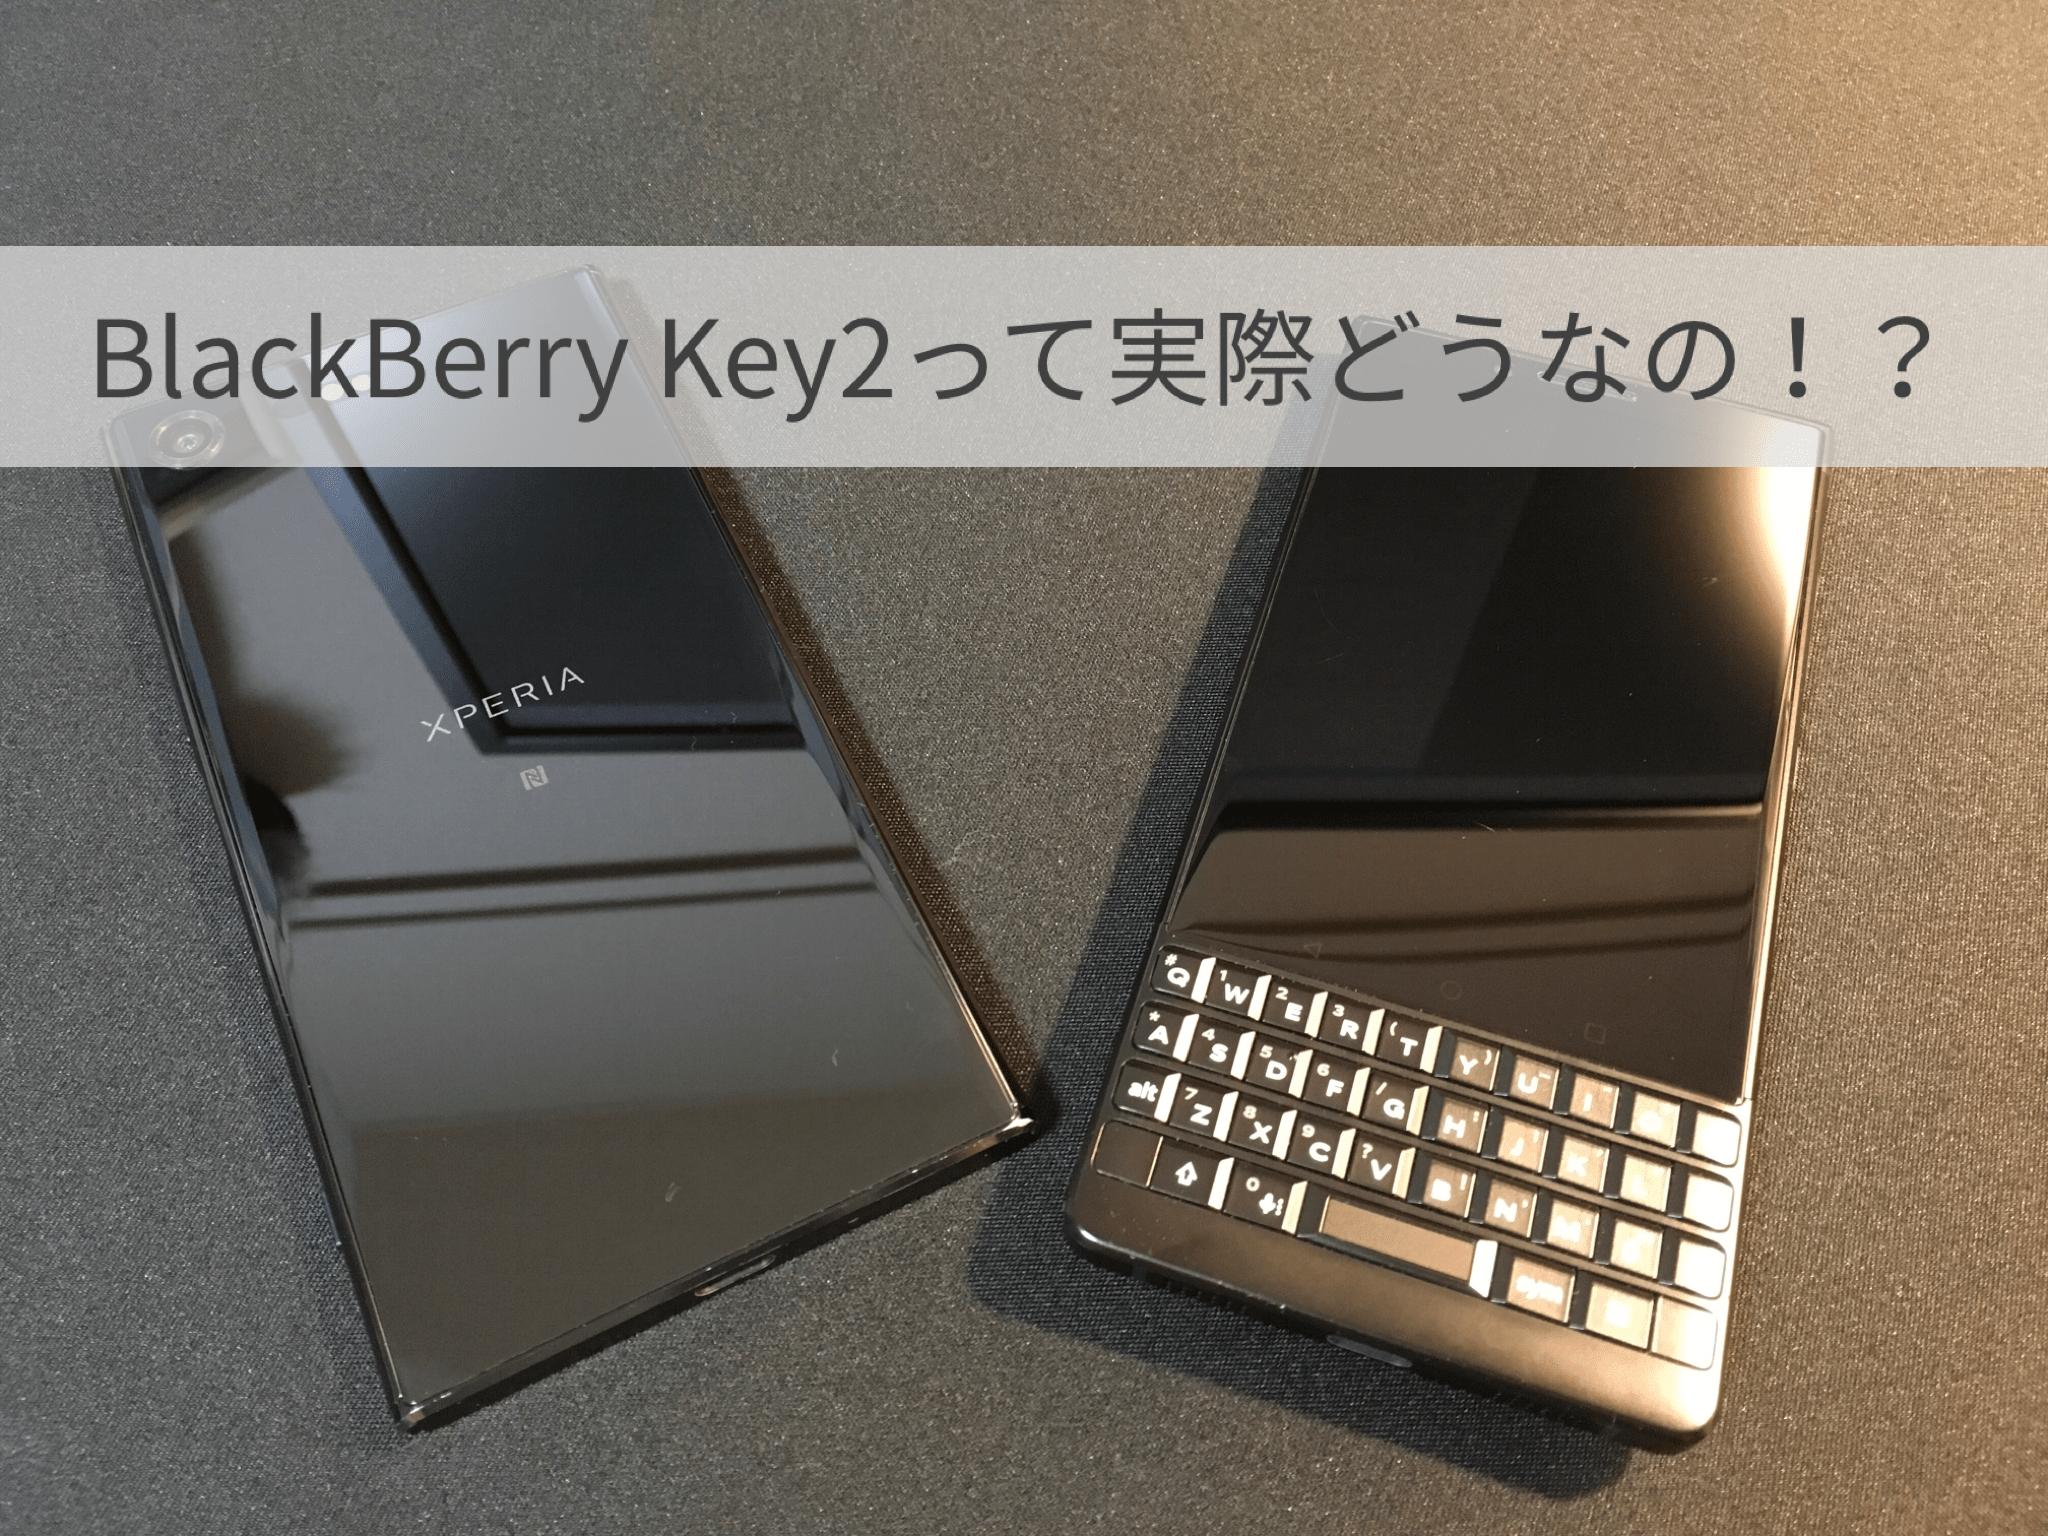 blackberry - 【レビュー】BlackBerry Key2を8ヶ月使ってわかった「普通のスマホ」との違い